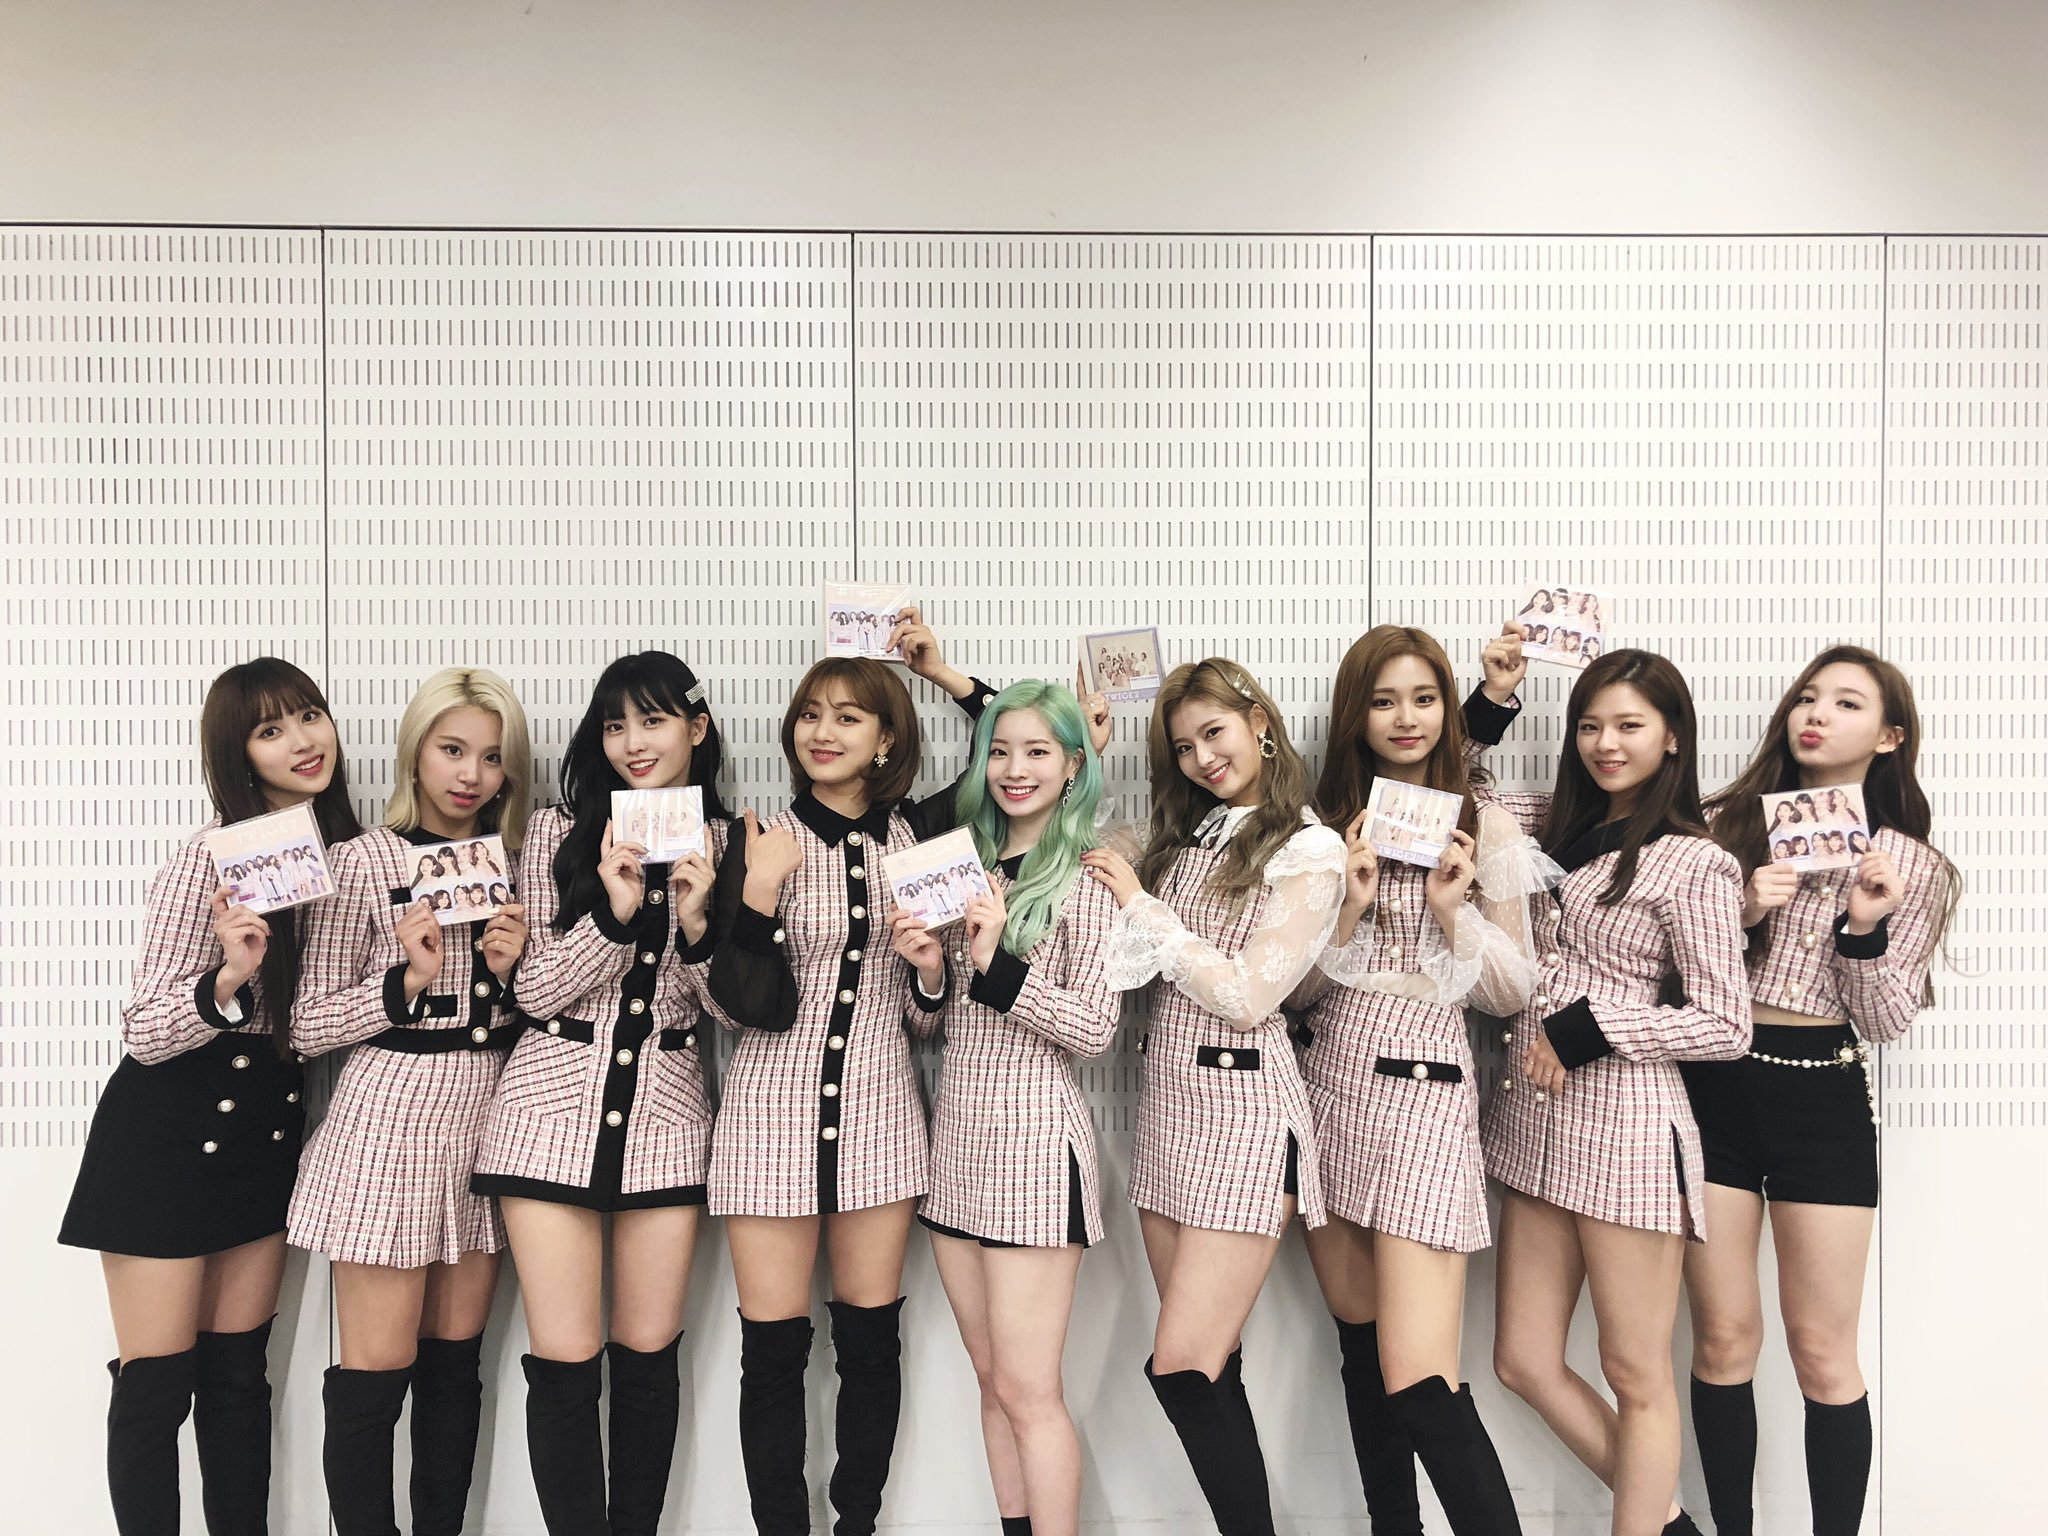 twice, twice profile, twice facts, twice members, twice age, twice height, twice leader, twice maknae, twice tour, twice debut, twice japan comeback